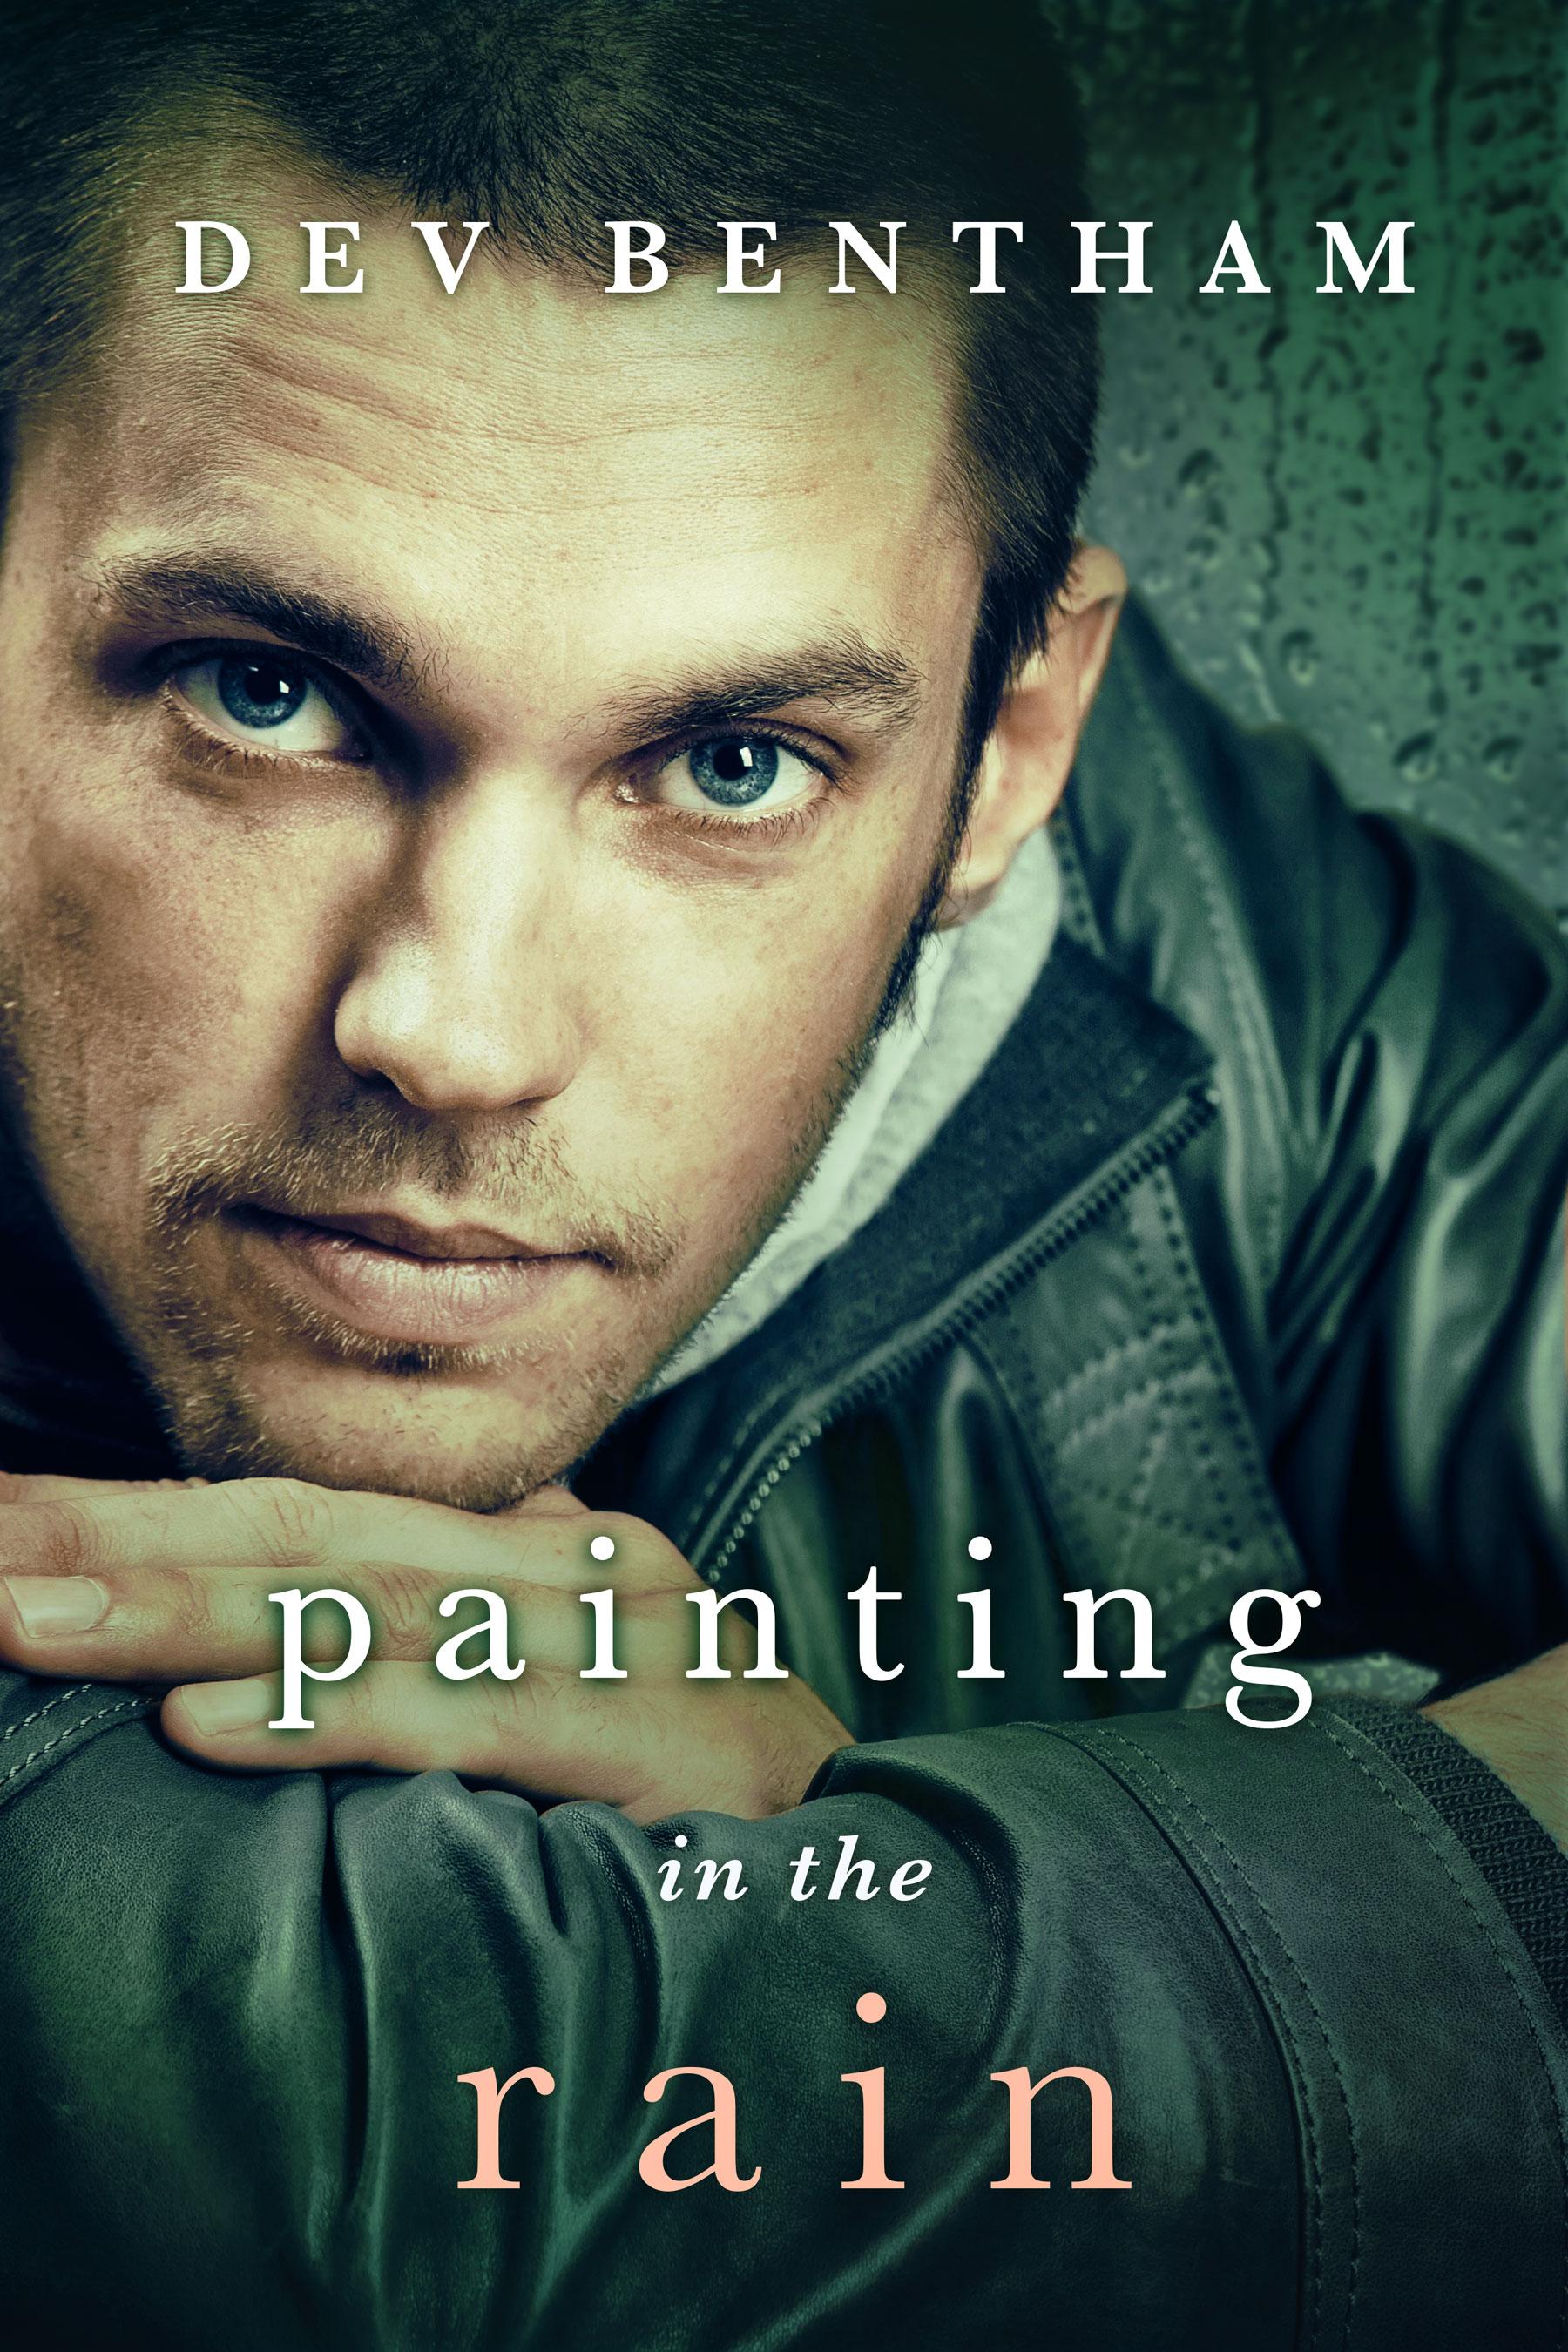 PaintingRain_large.jpg